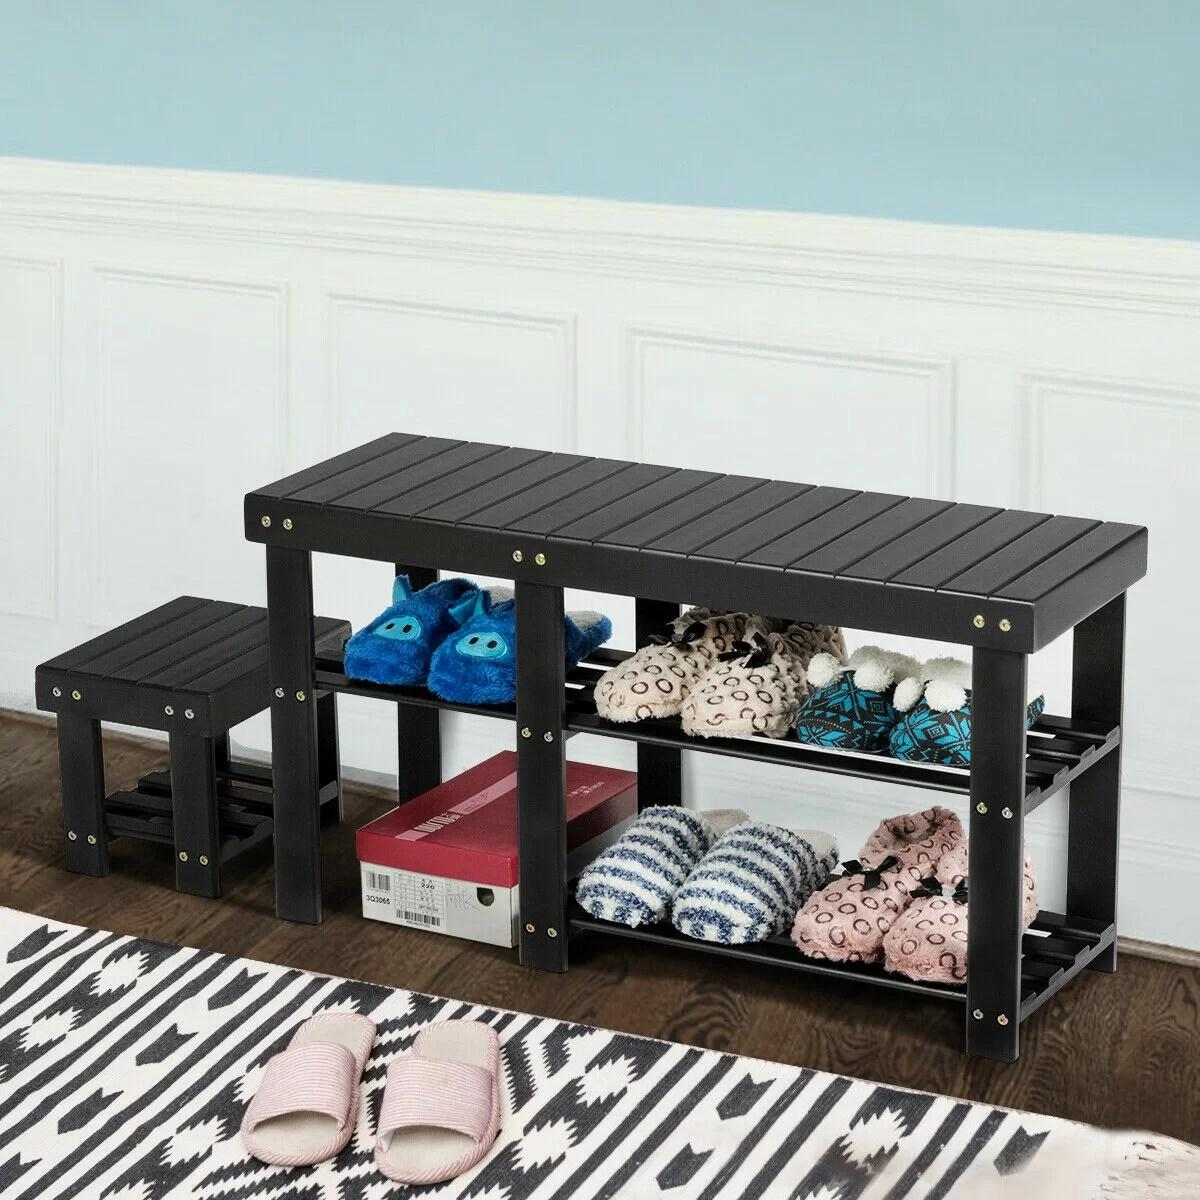 Latitude Run Bamboo Shoe Rack Bench With Stool Entryway 3 Tier Storage Organizer Black Reviews Wayfair